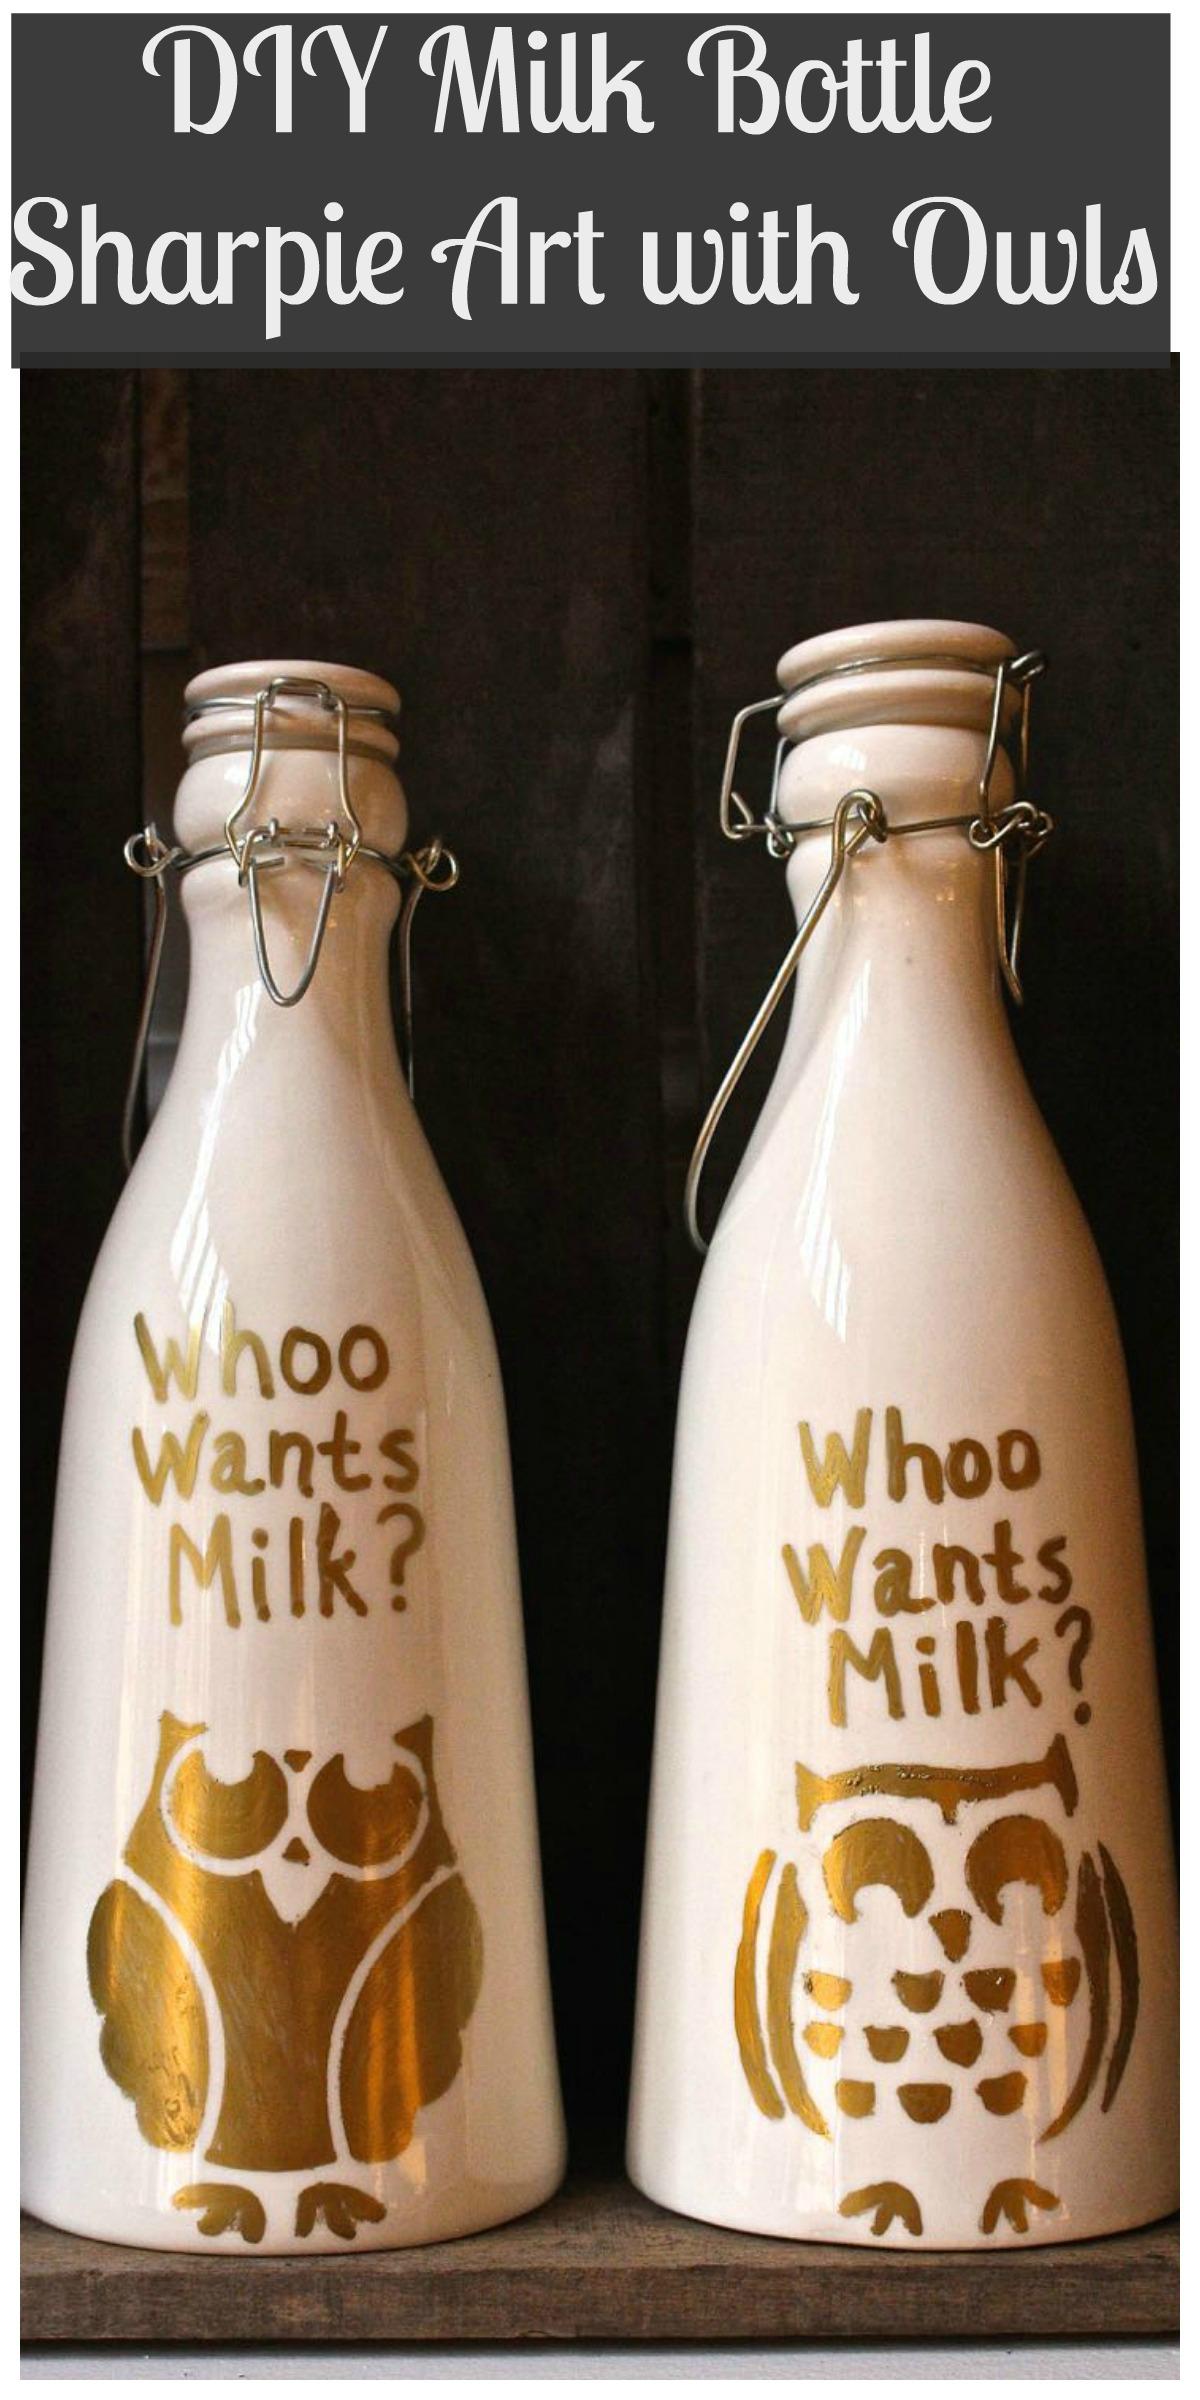 Owl Milk Bottle Collage